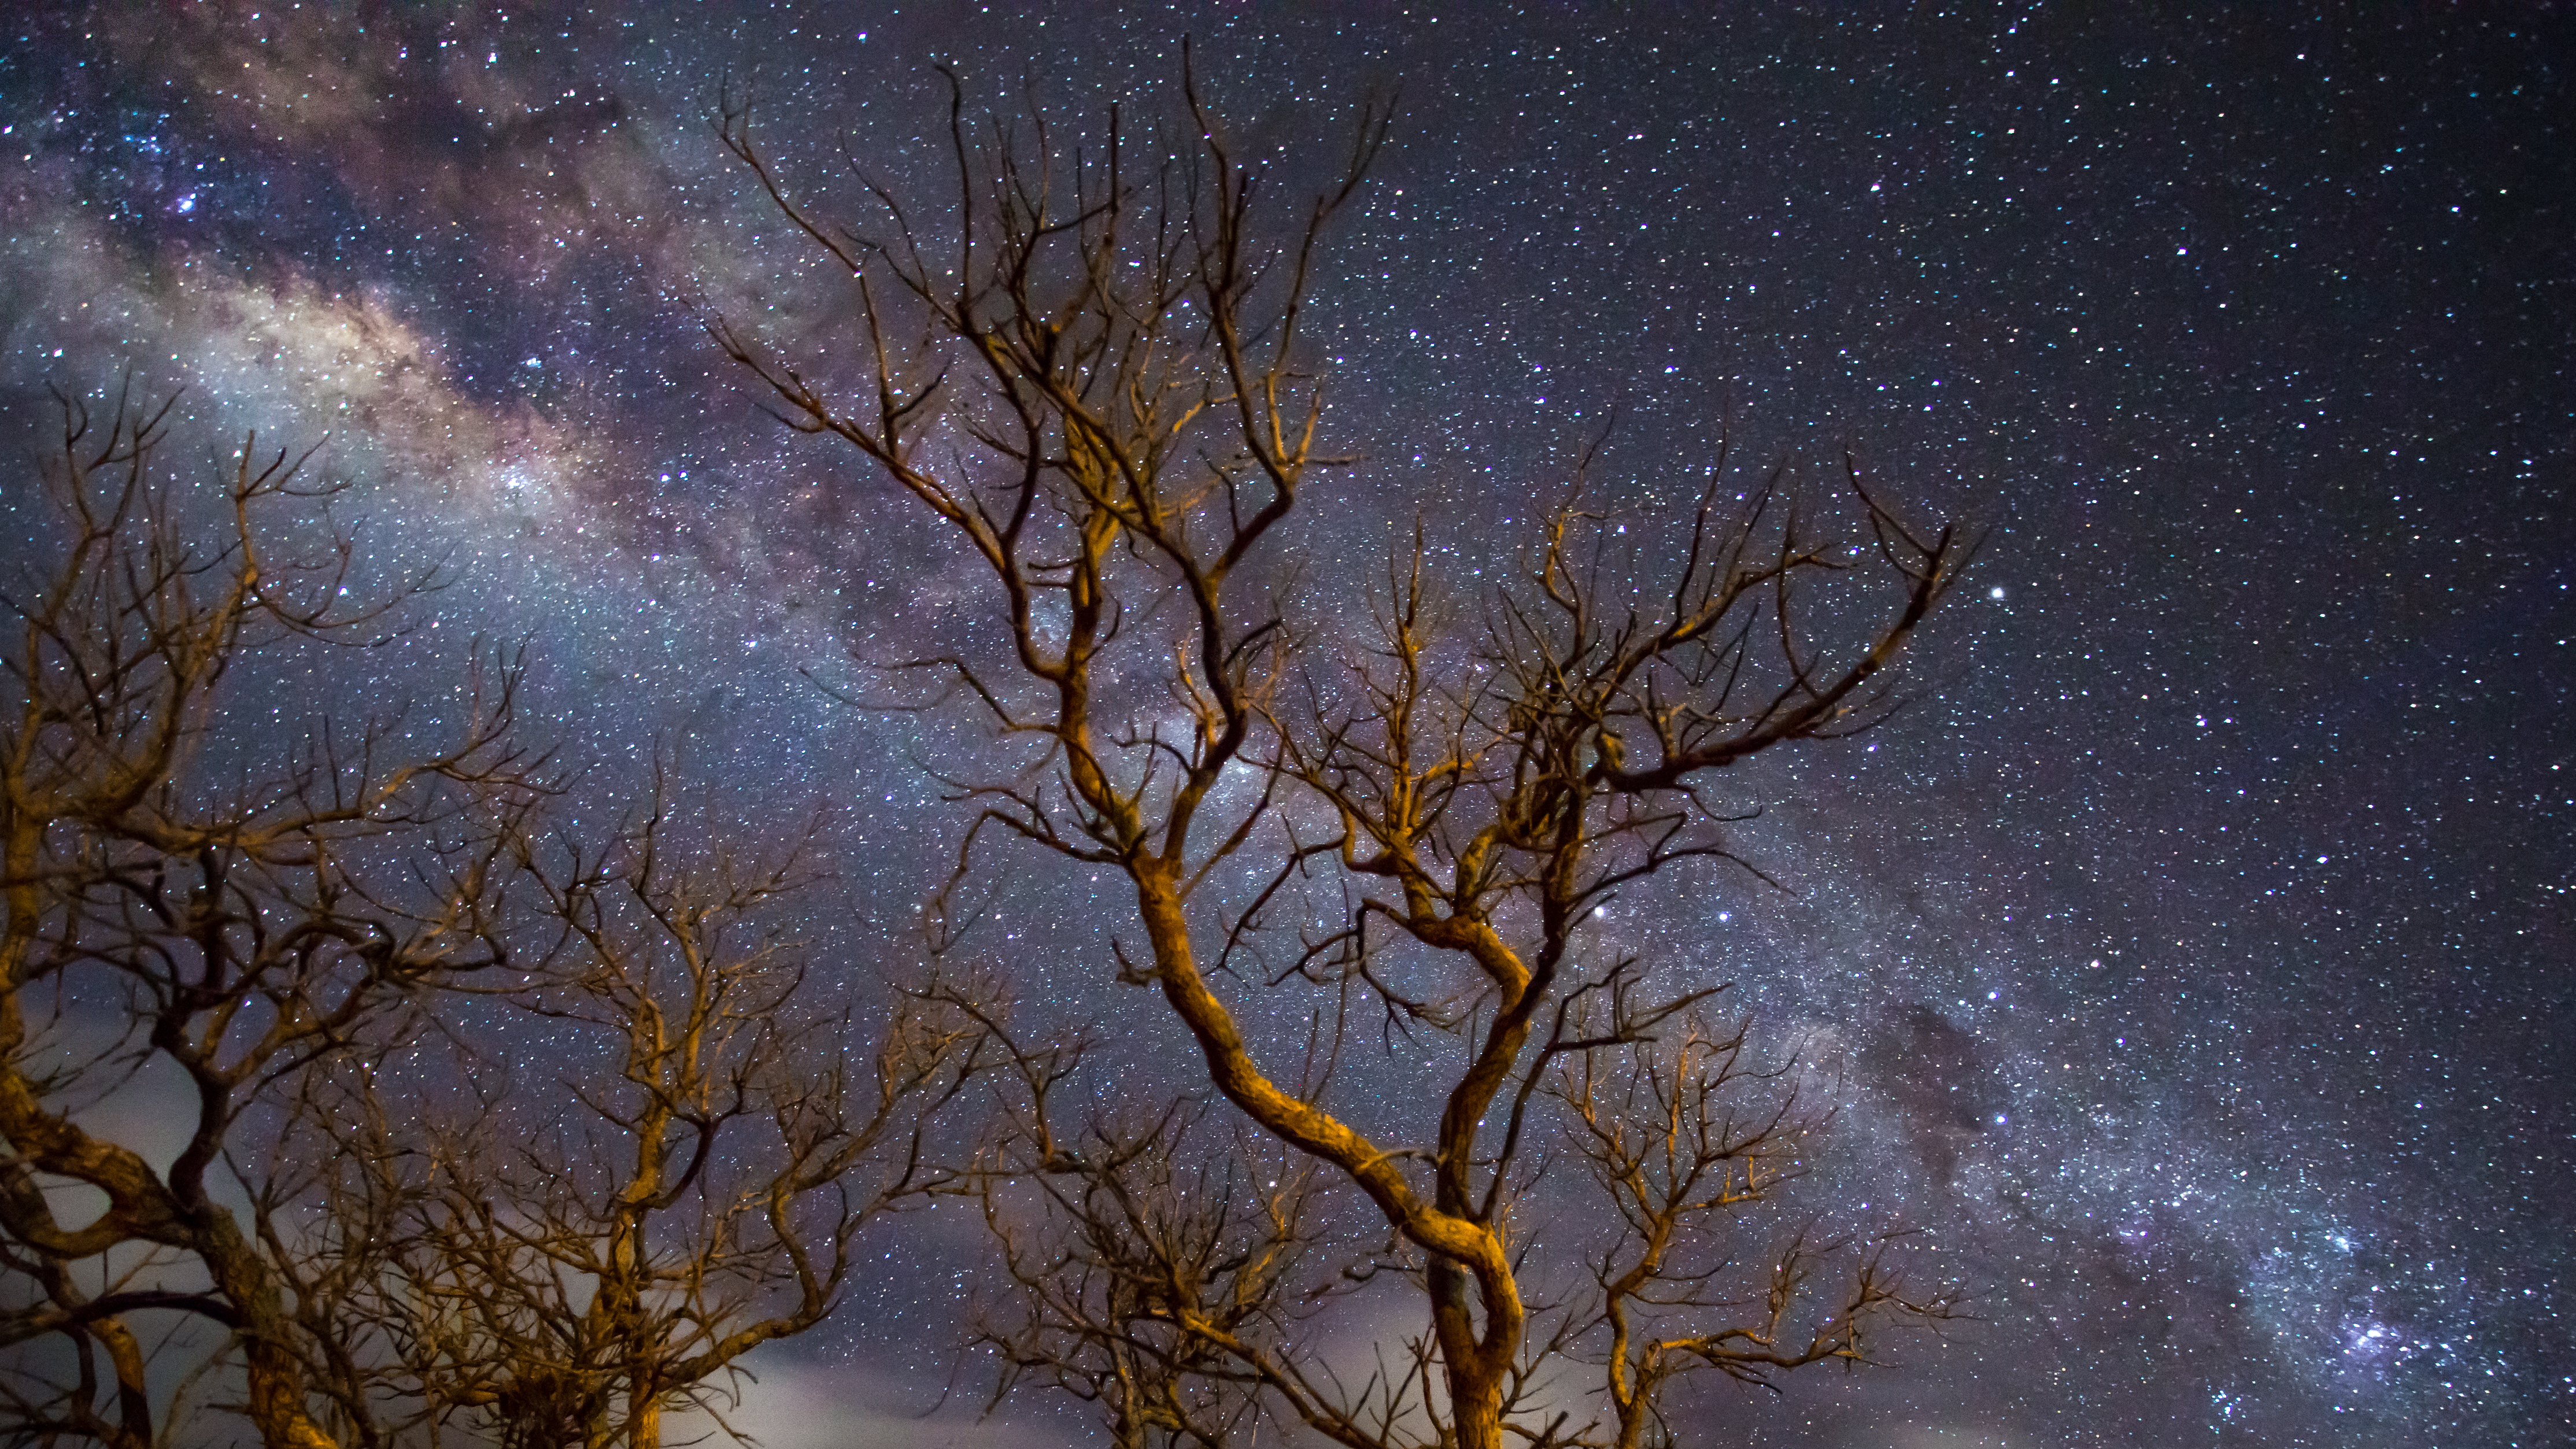 Milky Way Galaxy Tree Dark 4k Hd Nature 4k Wallpapers